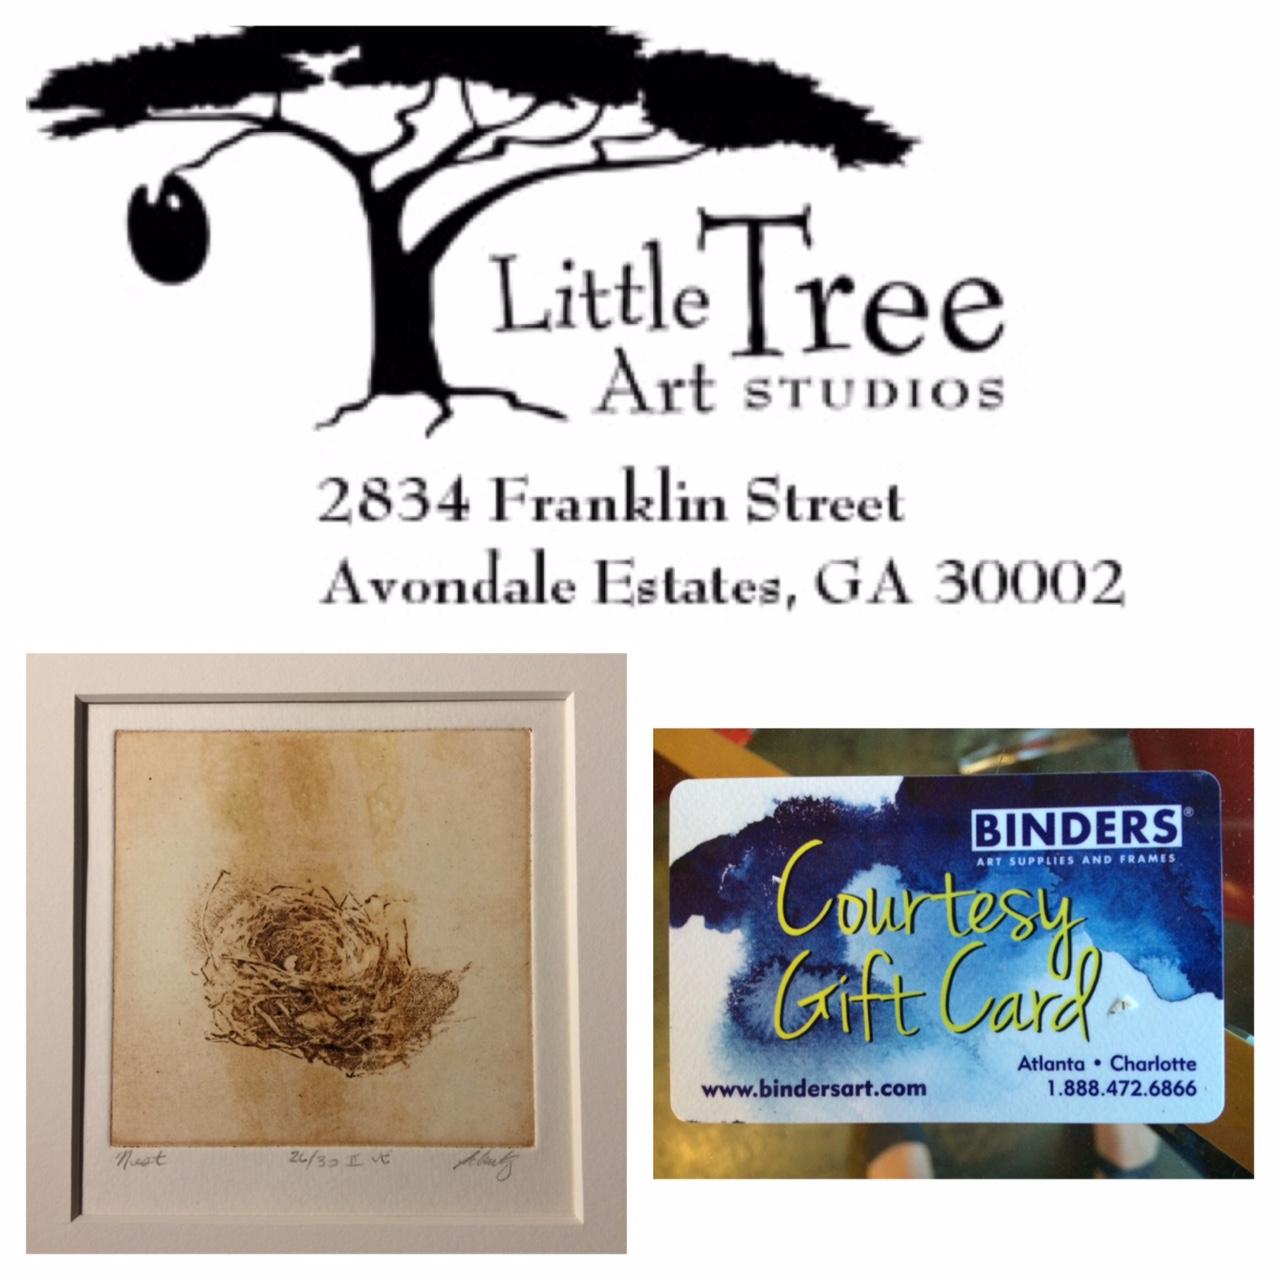 RAD2017 Raffle Winners - Little Tree Art Studios